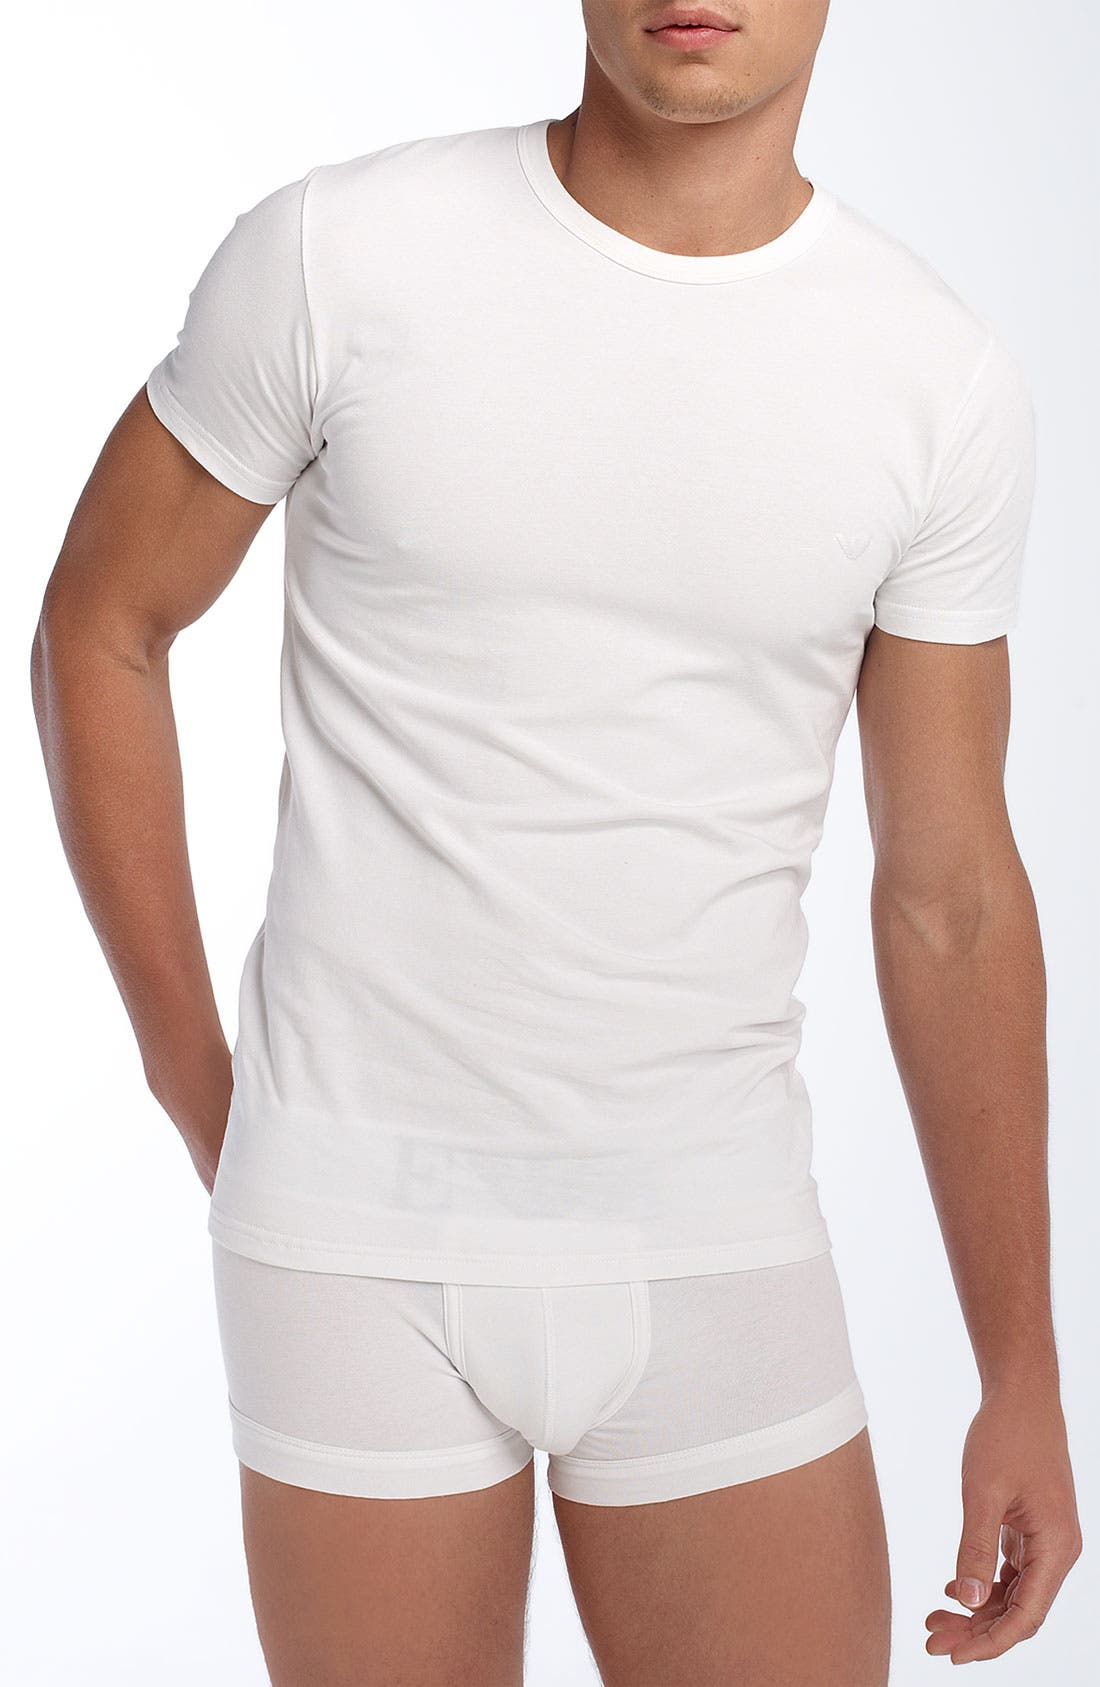 Alternate Image 1 Selected - Emporio Armani Crewneck Cotton T-Shirt